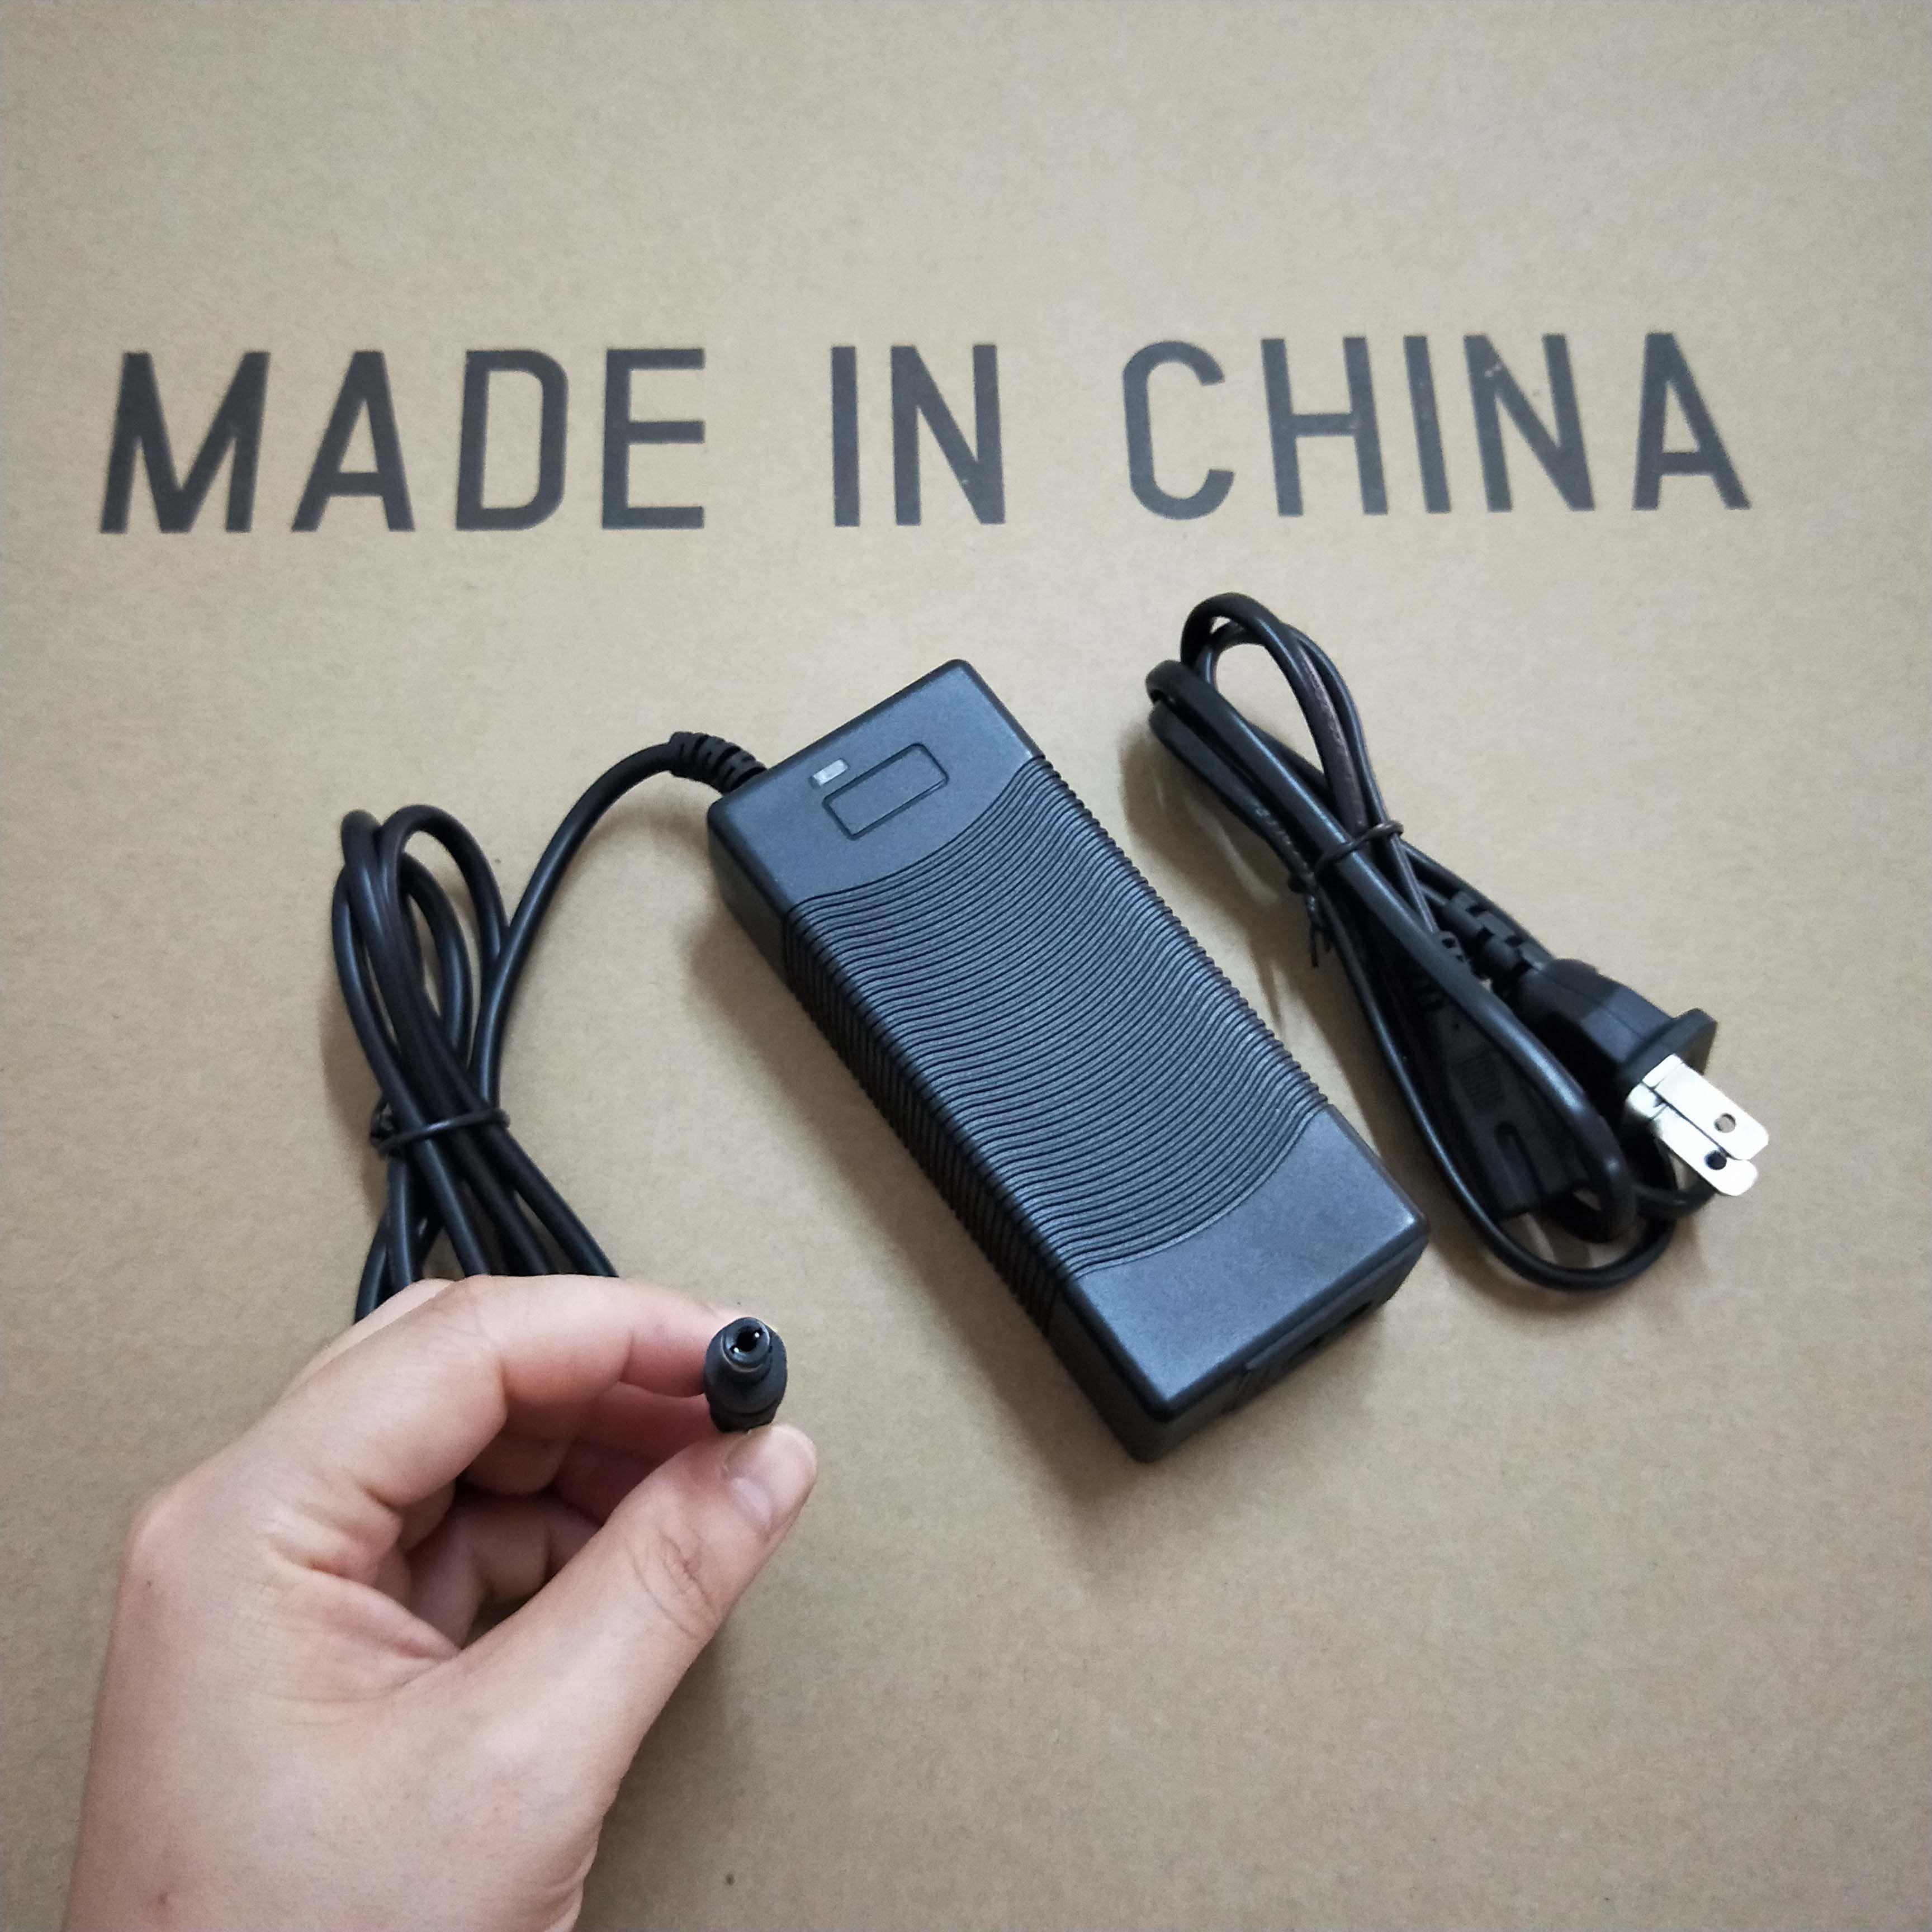 21V2A Smart Charger for 5S Lithium//Li-ion 18650 Battery 5.5*2.1 plug 110V US